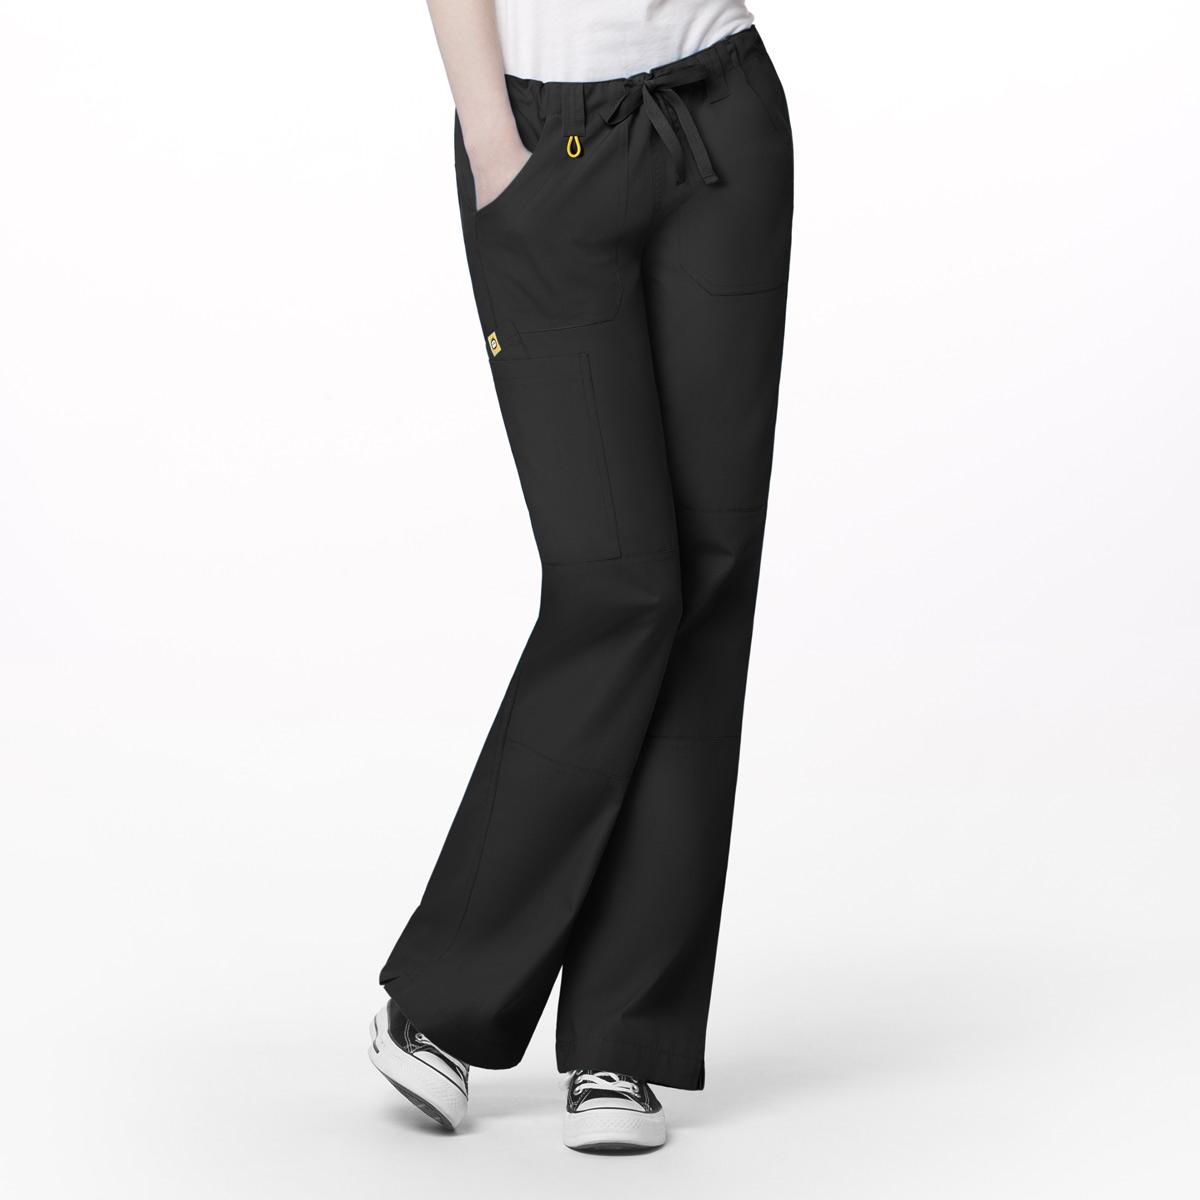 0ade62a754c Origins Tango Lady Fit Straight Leg Scrub Pants - WonderWink Scrubs